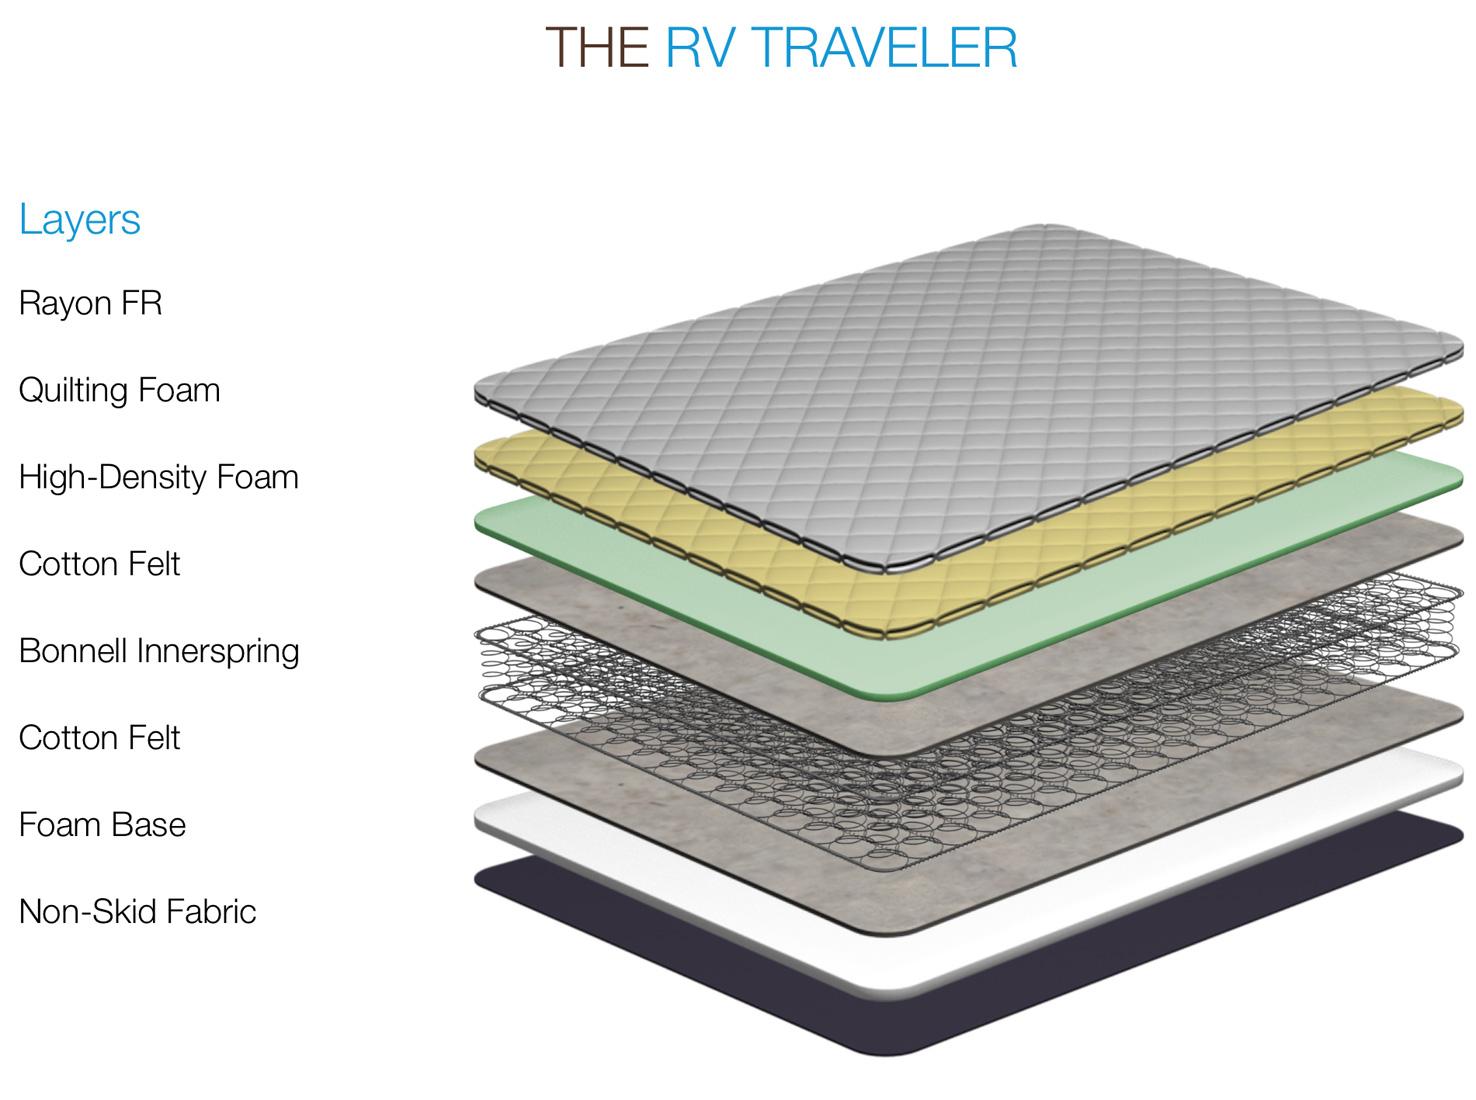 ... The Traveler RV Mattress - RIQ ... - Parklane RV - The Traveler RV Innerspring Mattress